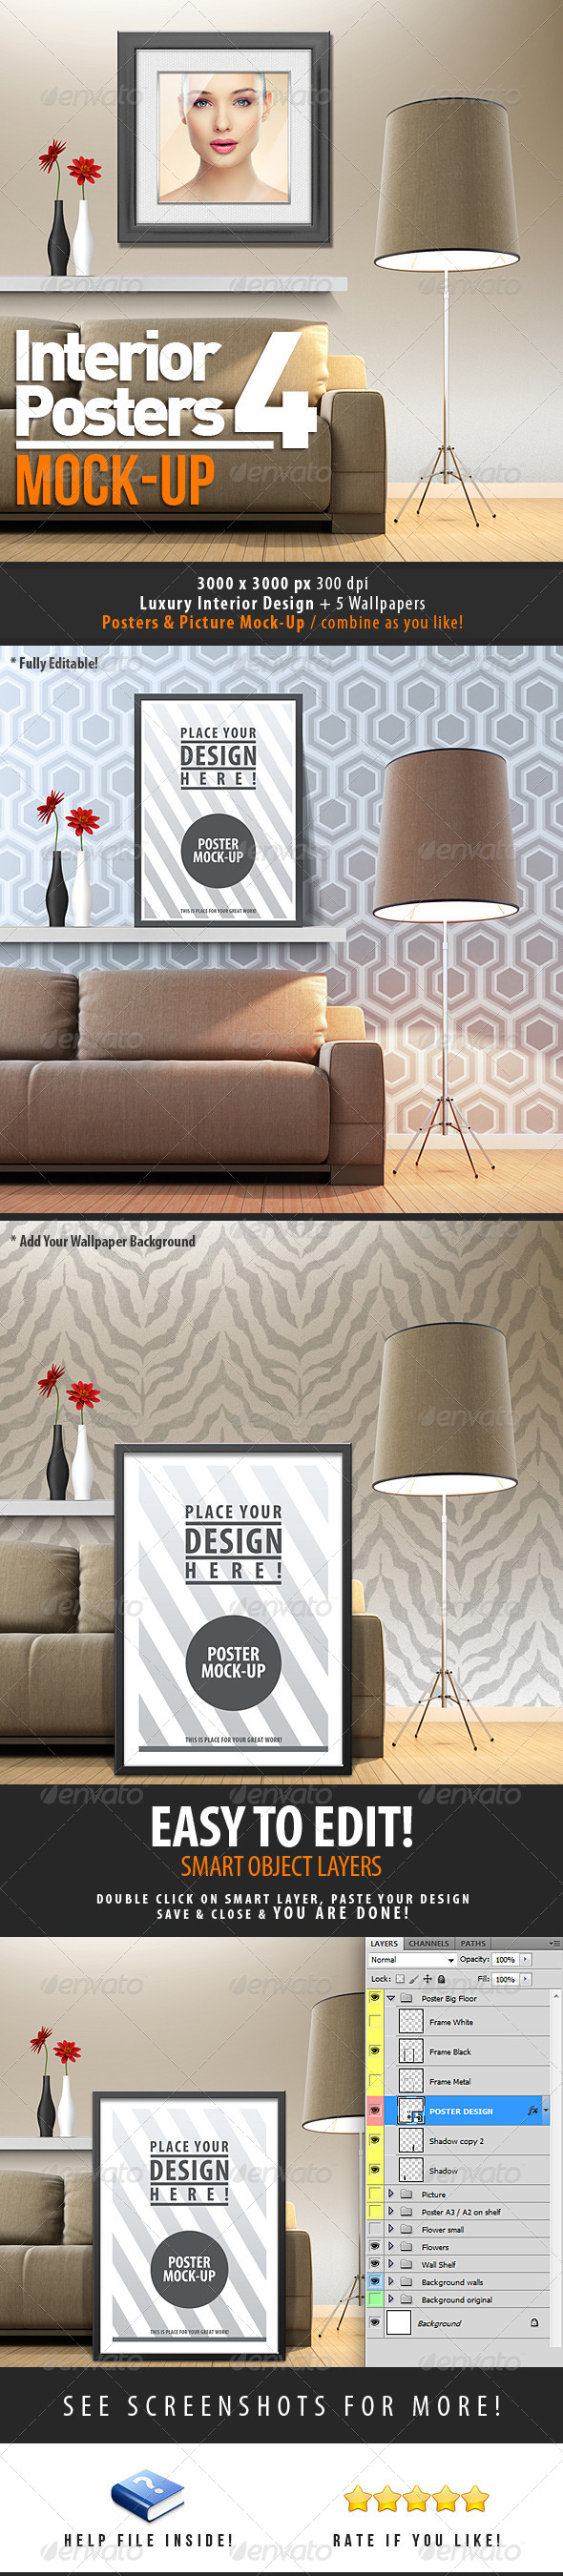 GraphicRiver Interior Posters Mock-Up Vol 4 4435791